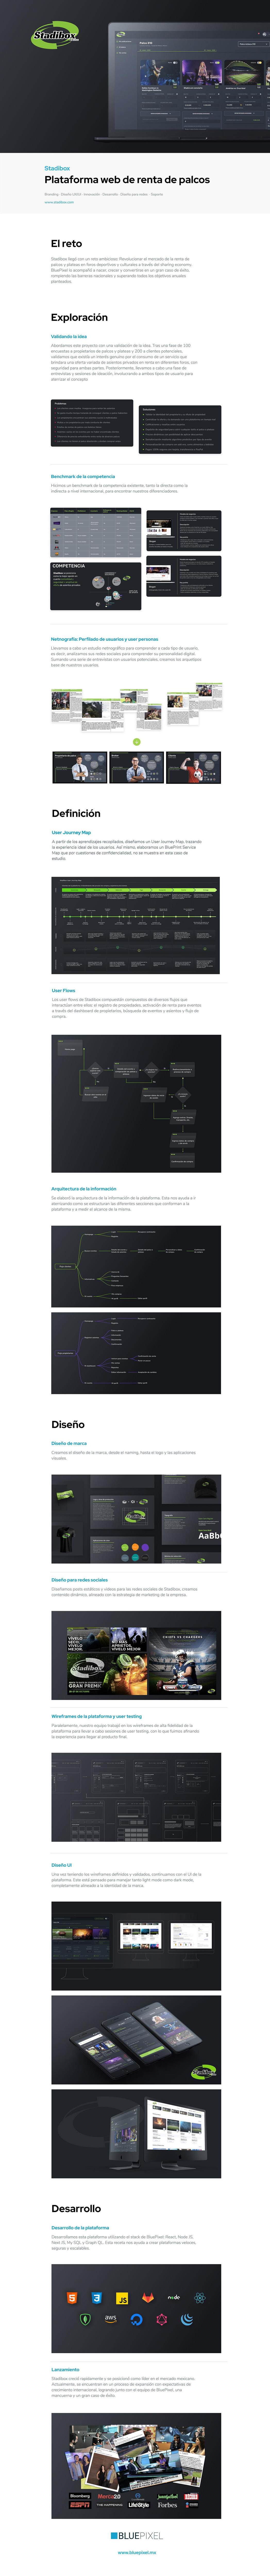 branding  darkmode innovation Marketplace sports platform ui design UX Case Study UX design uxui web development